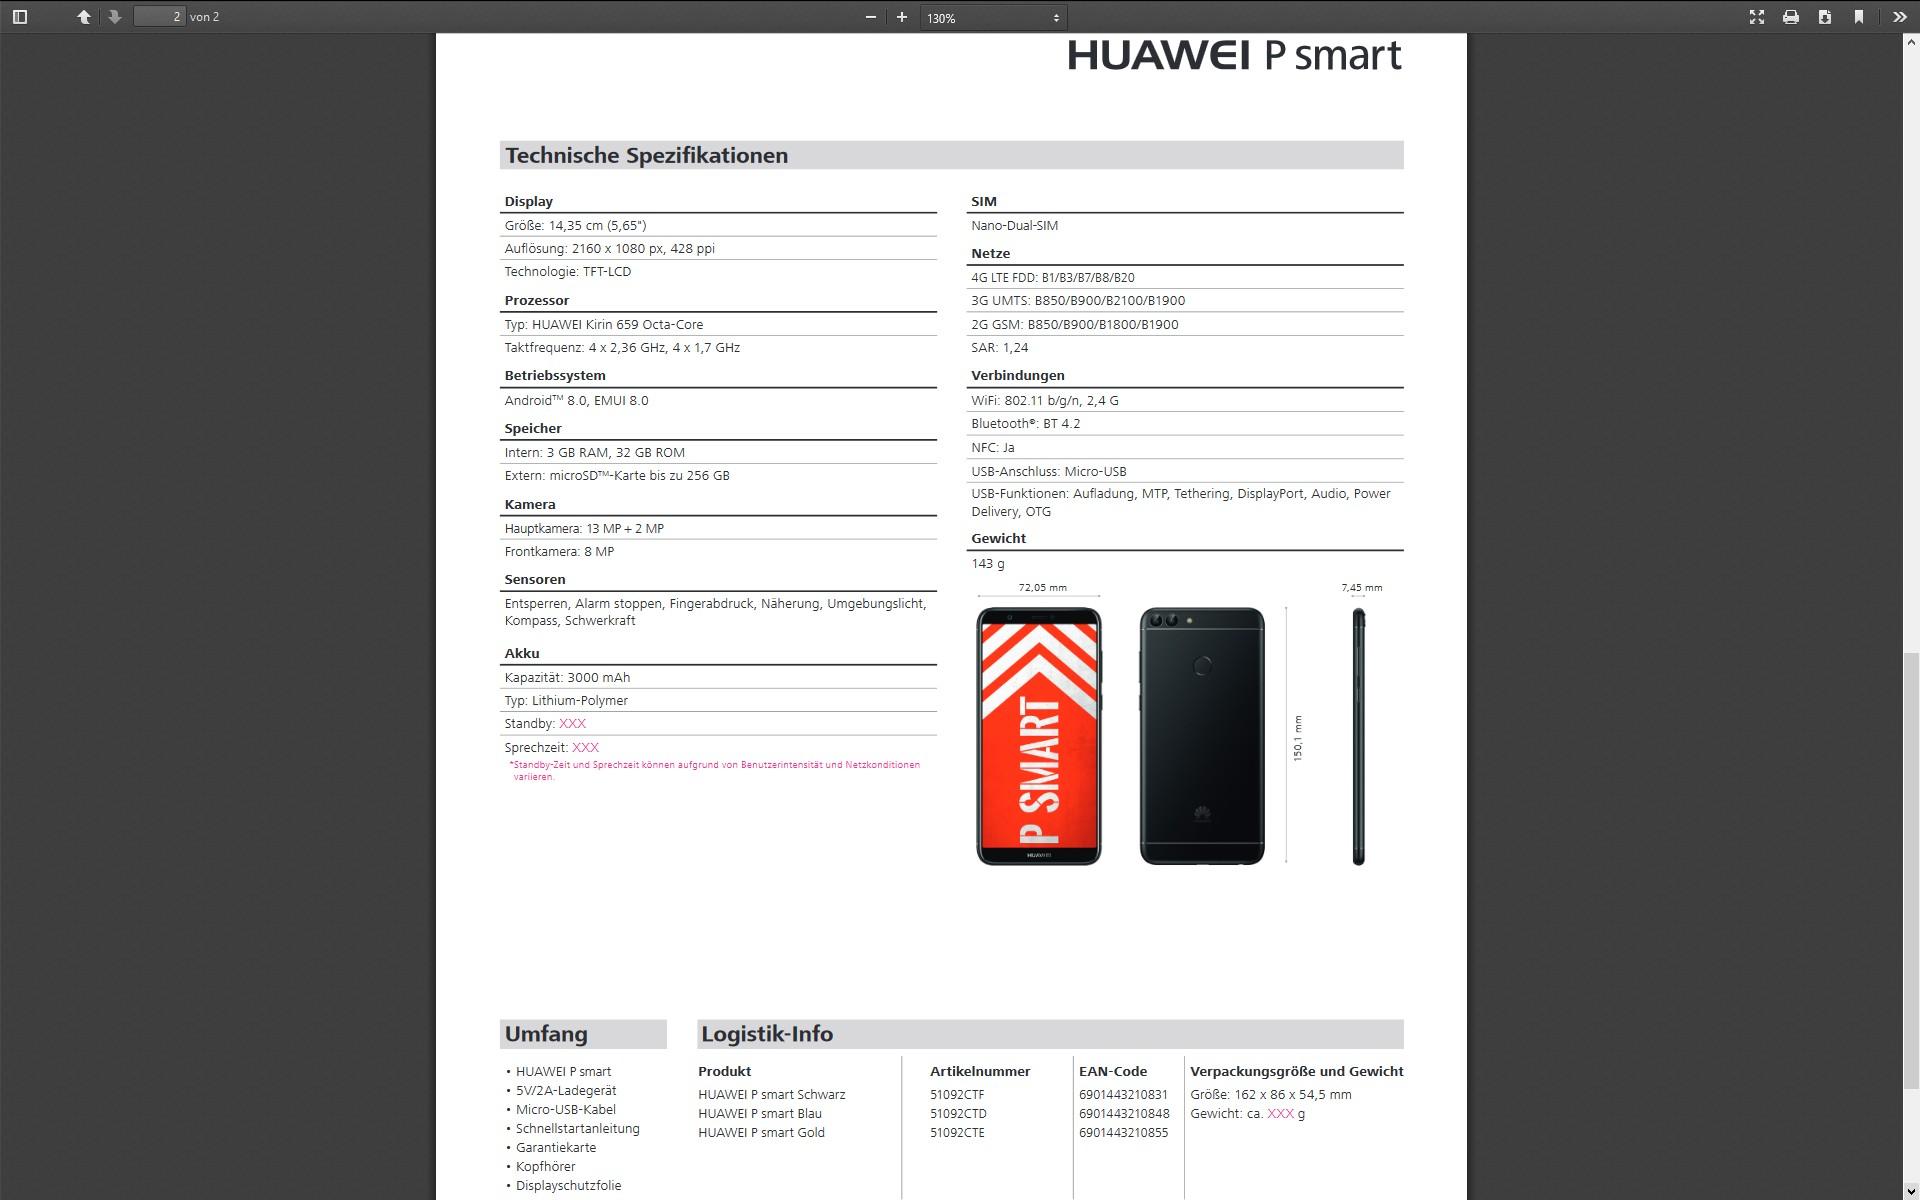 Huawei P Smart 5 6 Zoll Smartphone Mit 2 160 X 1 080 Pixeln Und Android 8 Oreo F 252 R 260 Euro